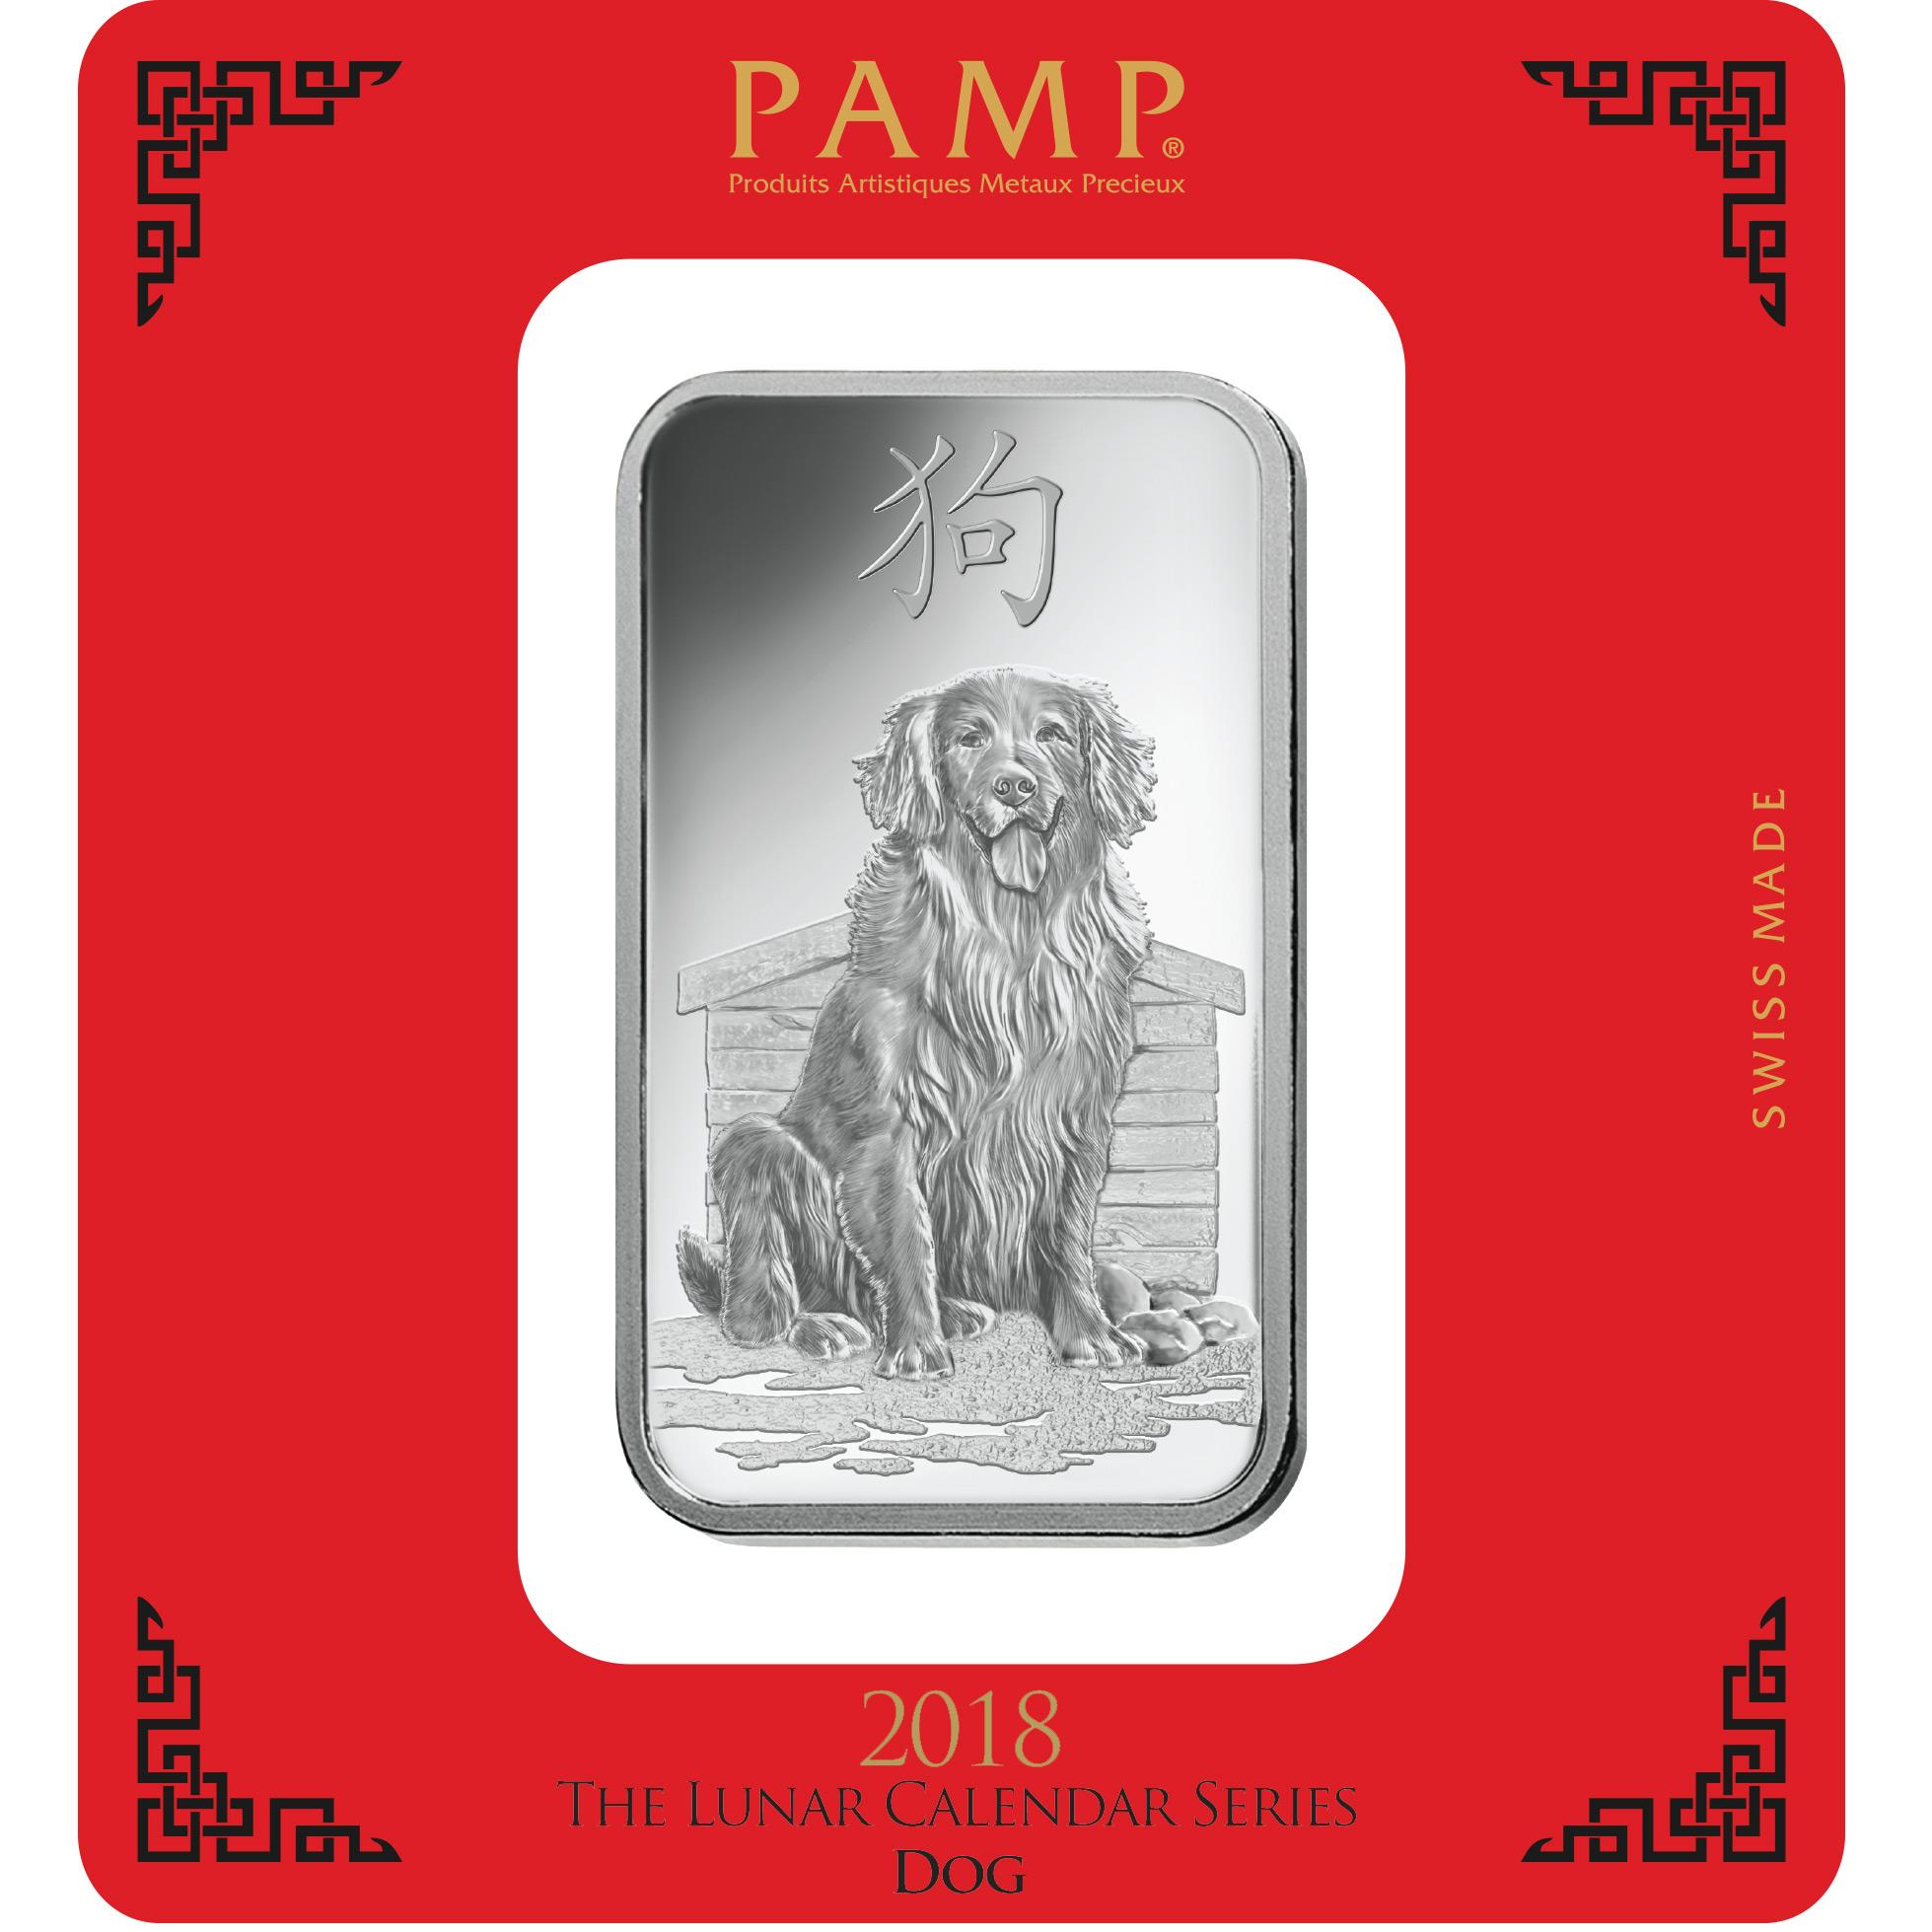 100 Gramm FeinSilberbarren 999.0 - PAMP Suisse Lunar Hund